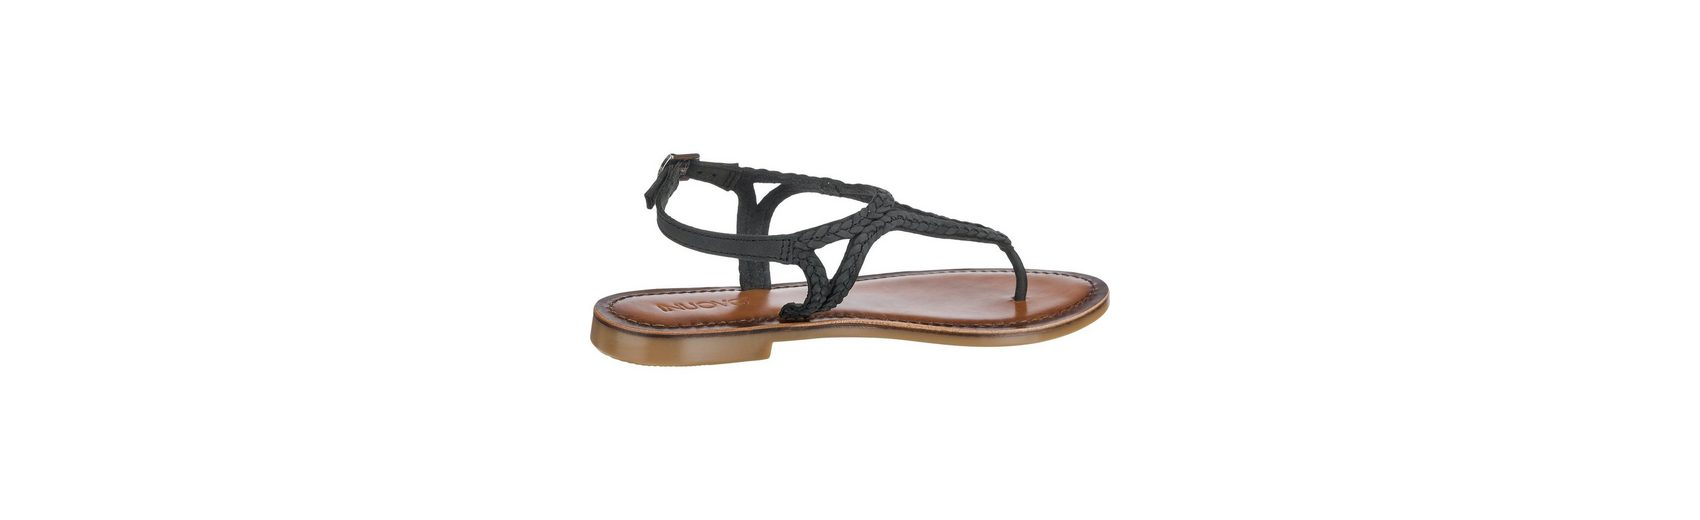 Billig Verkauf Bestseller INUOVO Sandaletten Sneakernews Online GmaiA9r